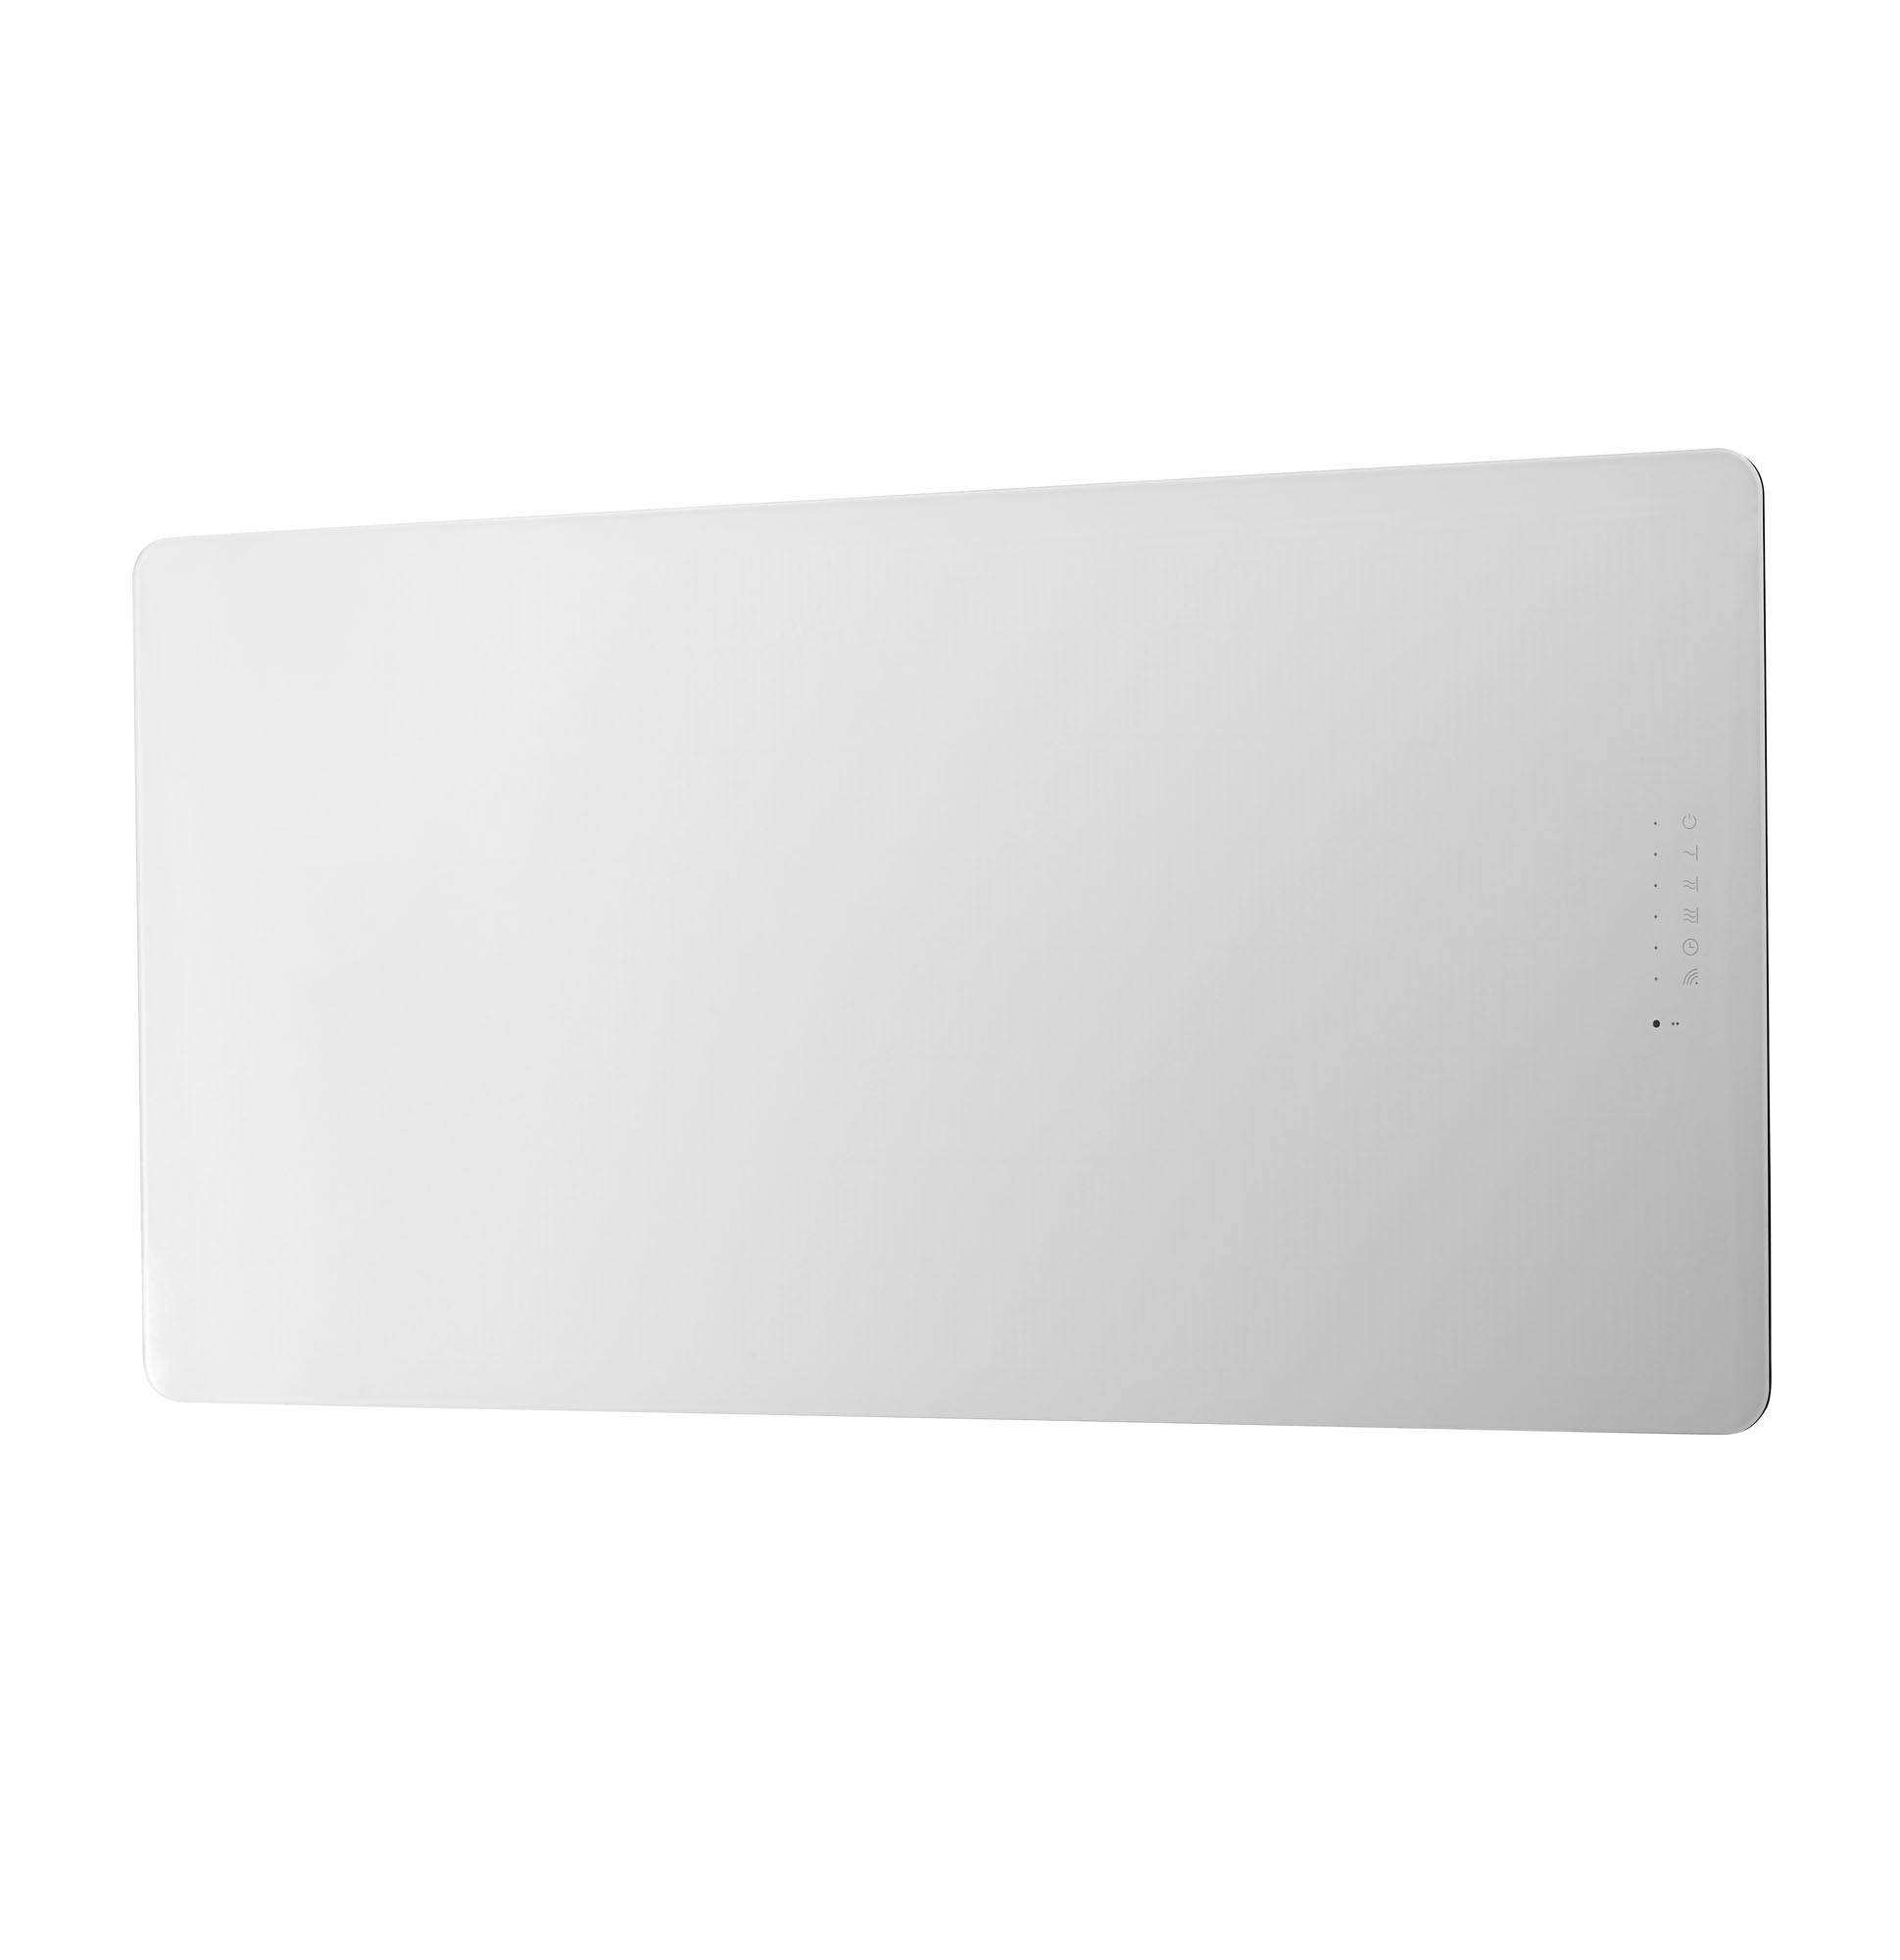 Vetro Frame Horizontal Electric Radiator White Frontlinebathrooms Com